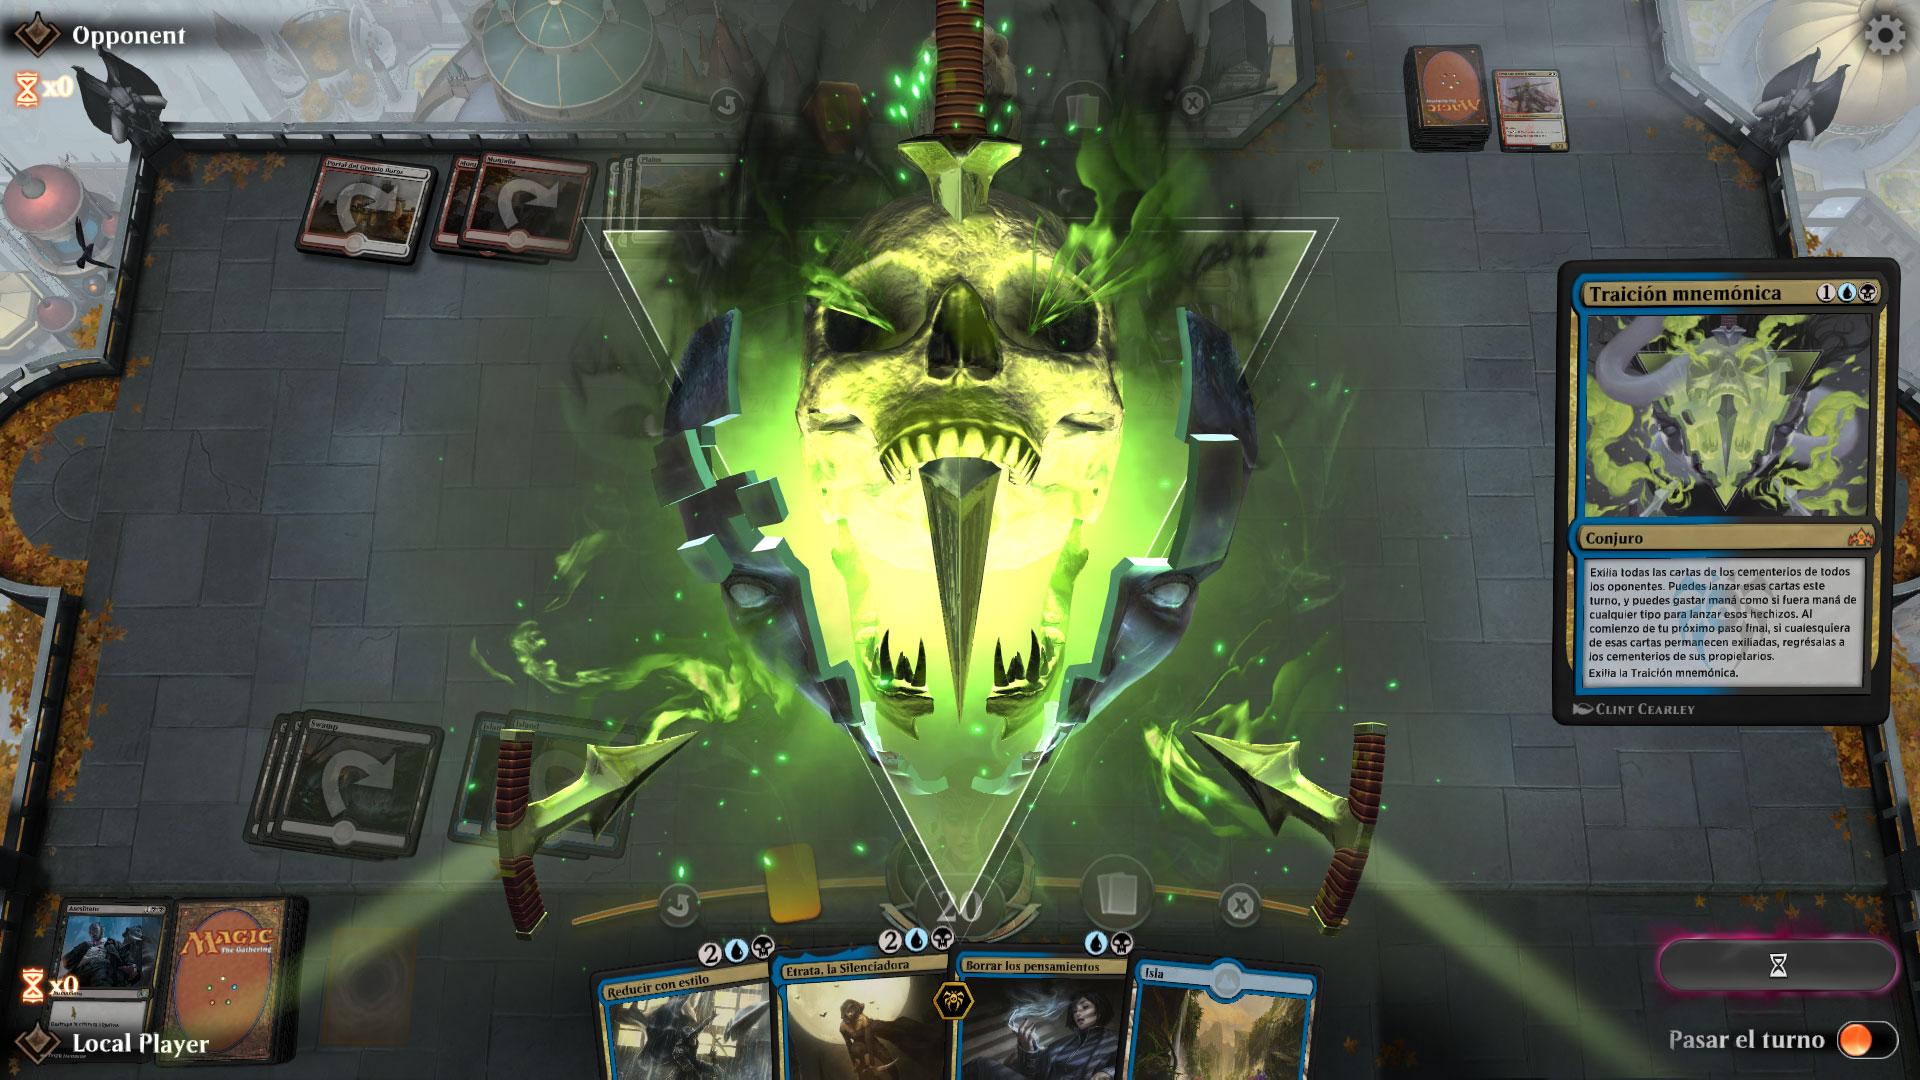 Magic: The Gathering Arena Portada 1v1